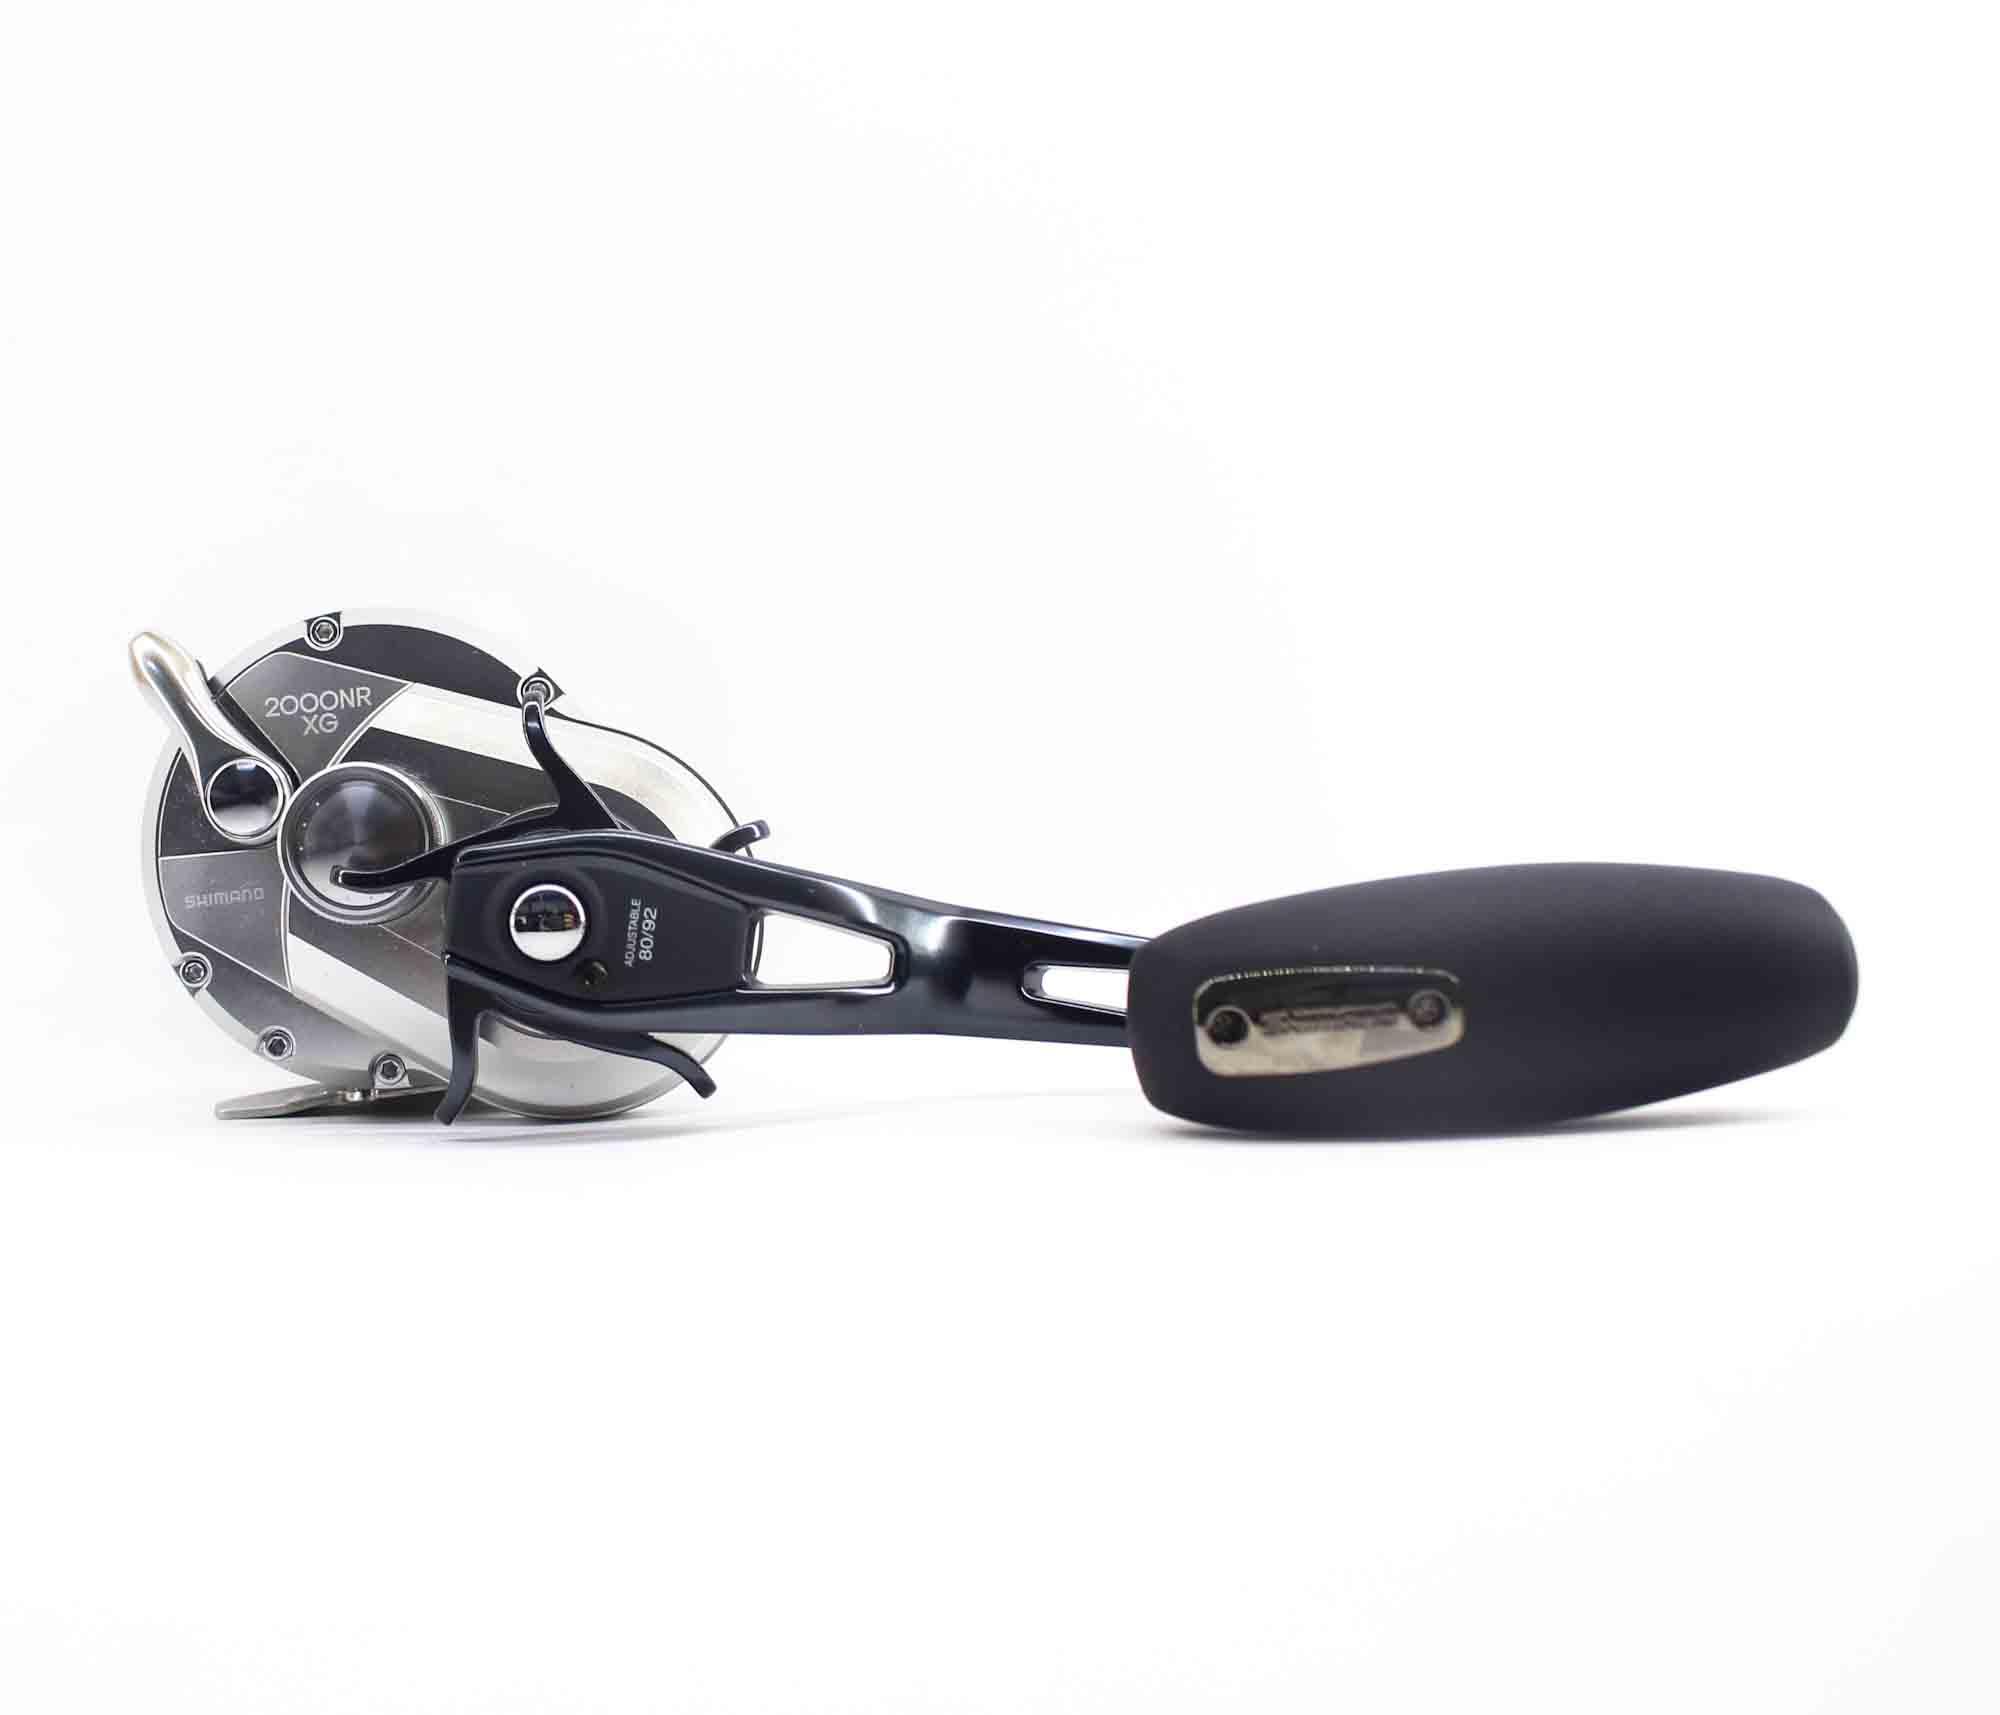 Shimano Reel Baitcast Ocea Jigger 2000 NRXG Right Hand (3801)